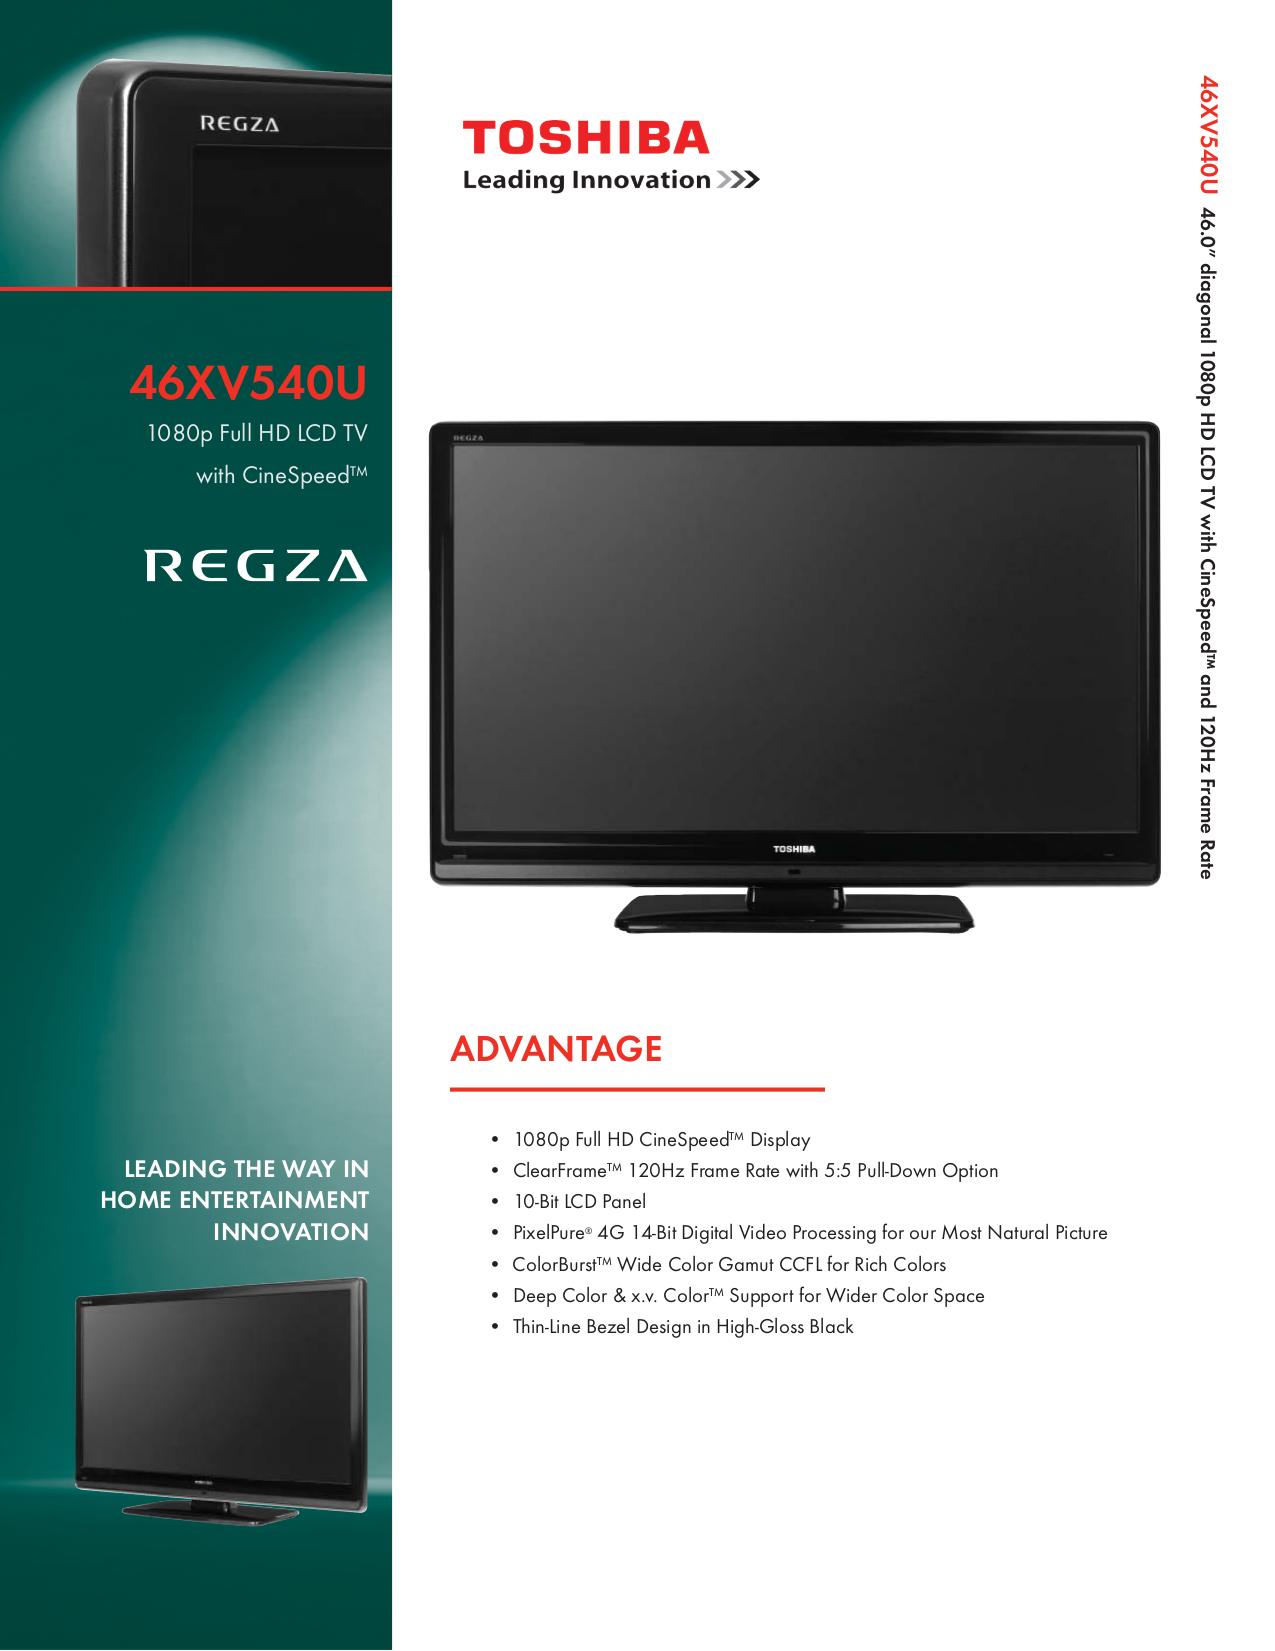 download free pdf for toshiba regza 46xv540u tv manual rh umlib com toshiba tv regza manuel toshiba regza 42x3030d tv manual